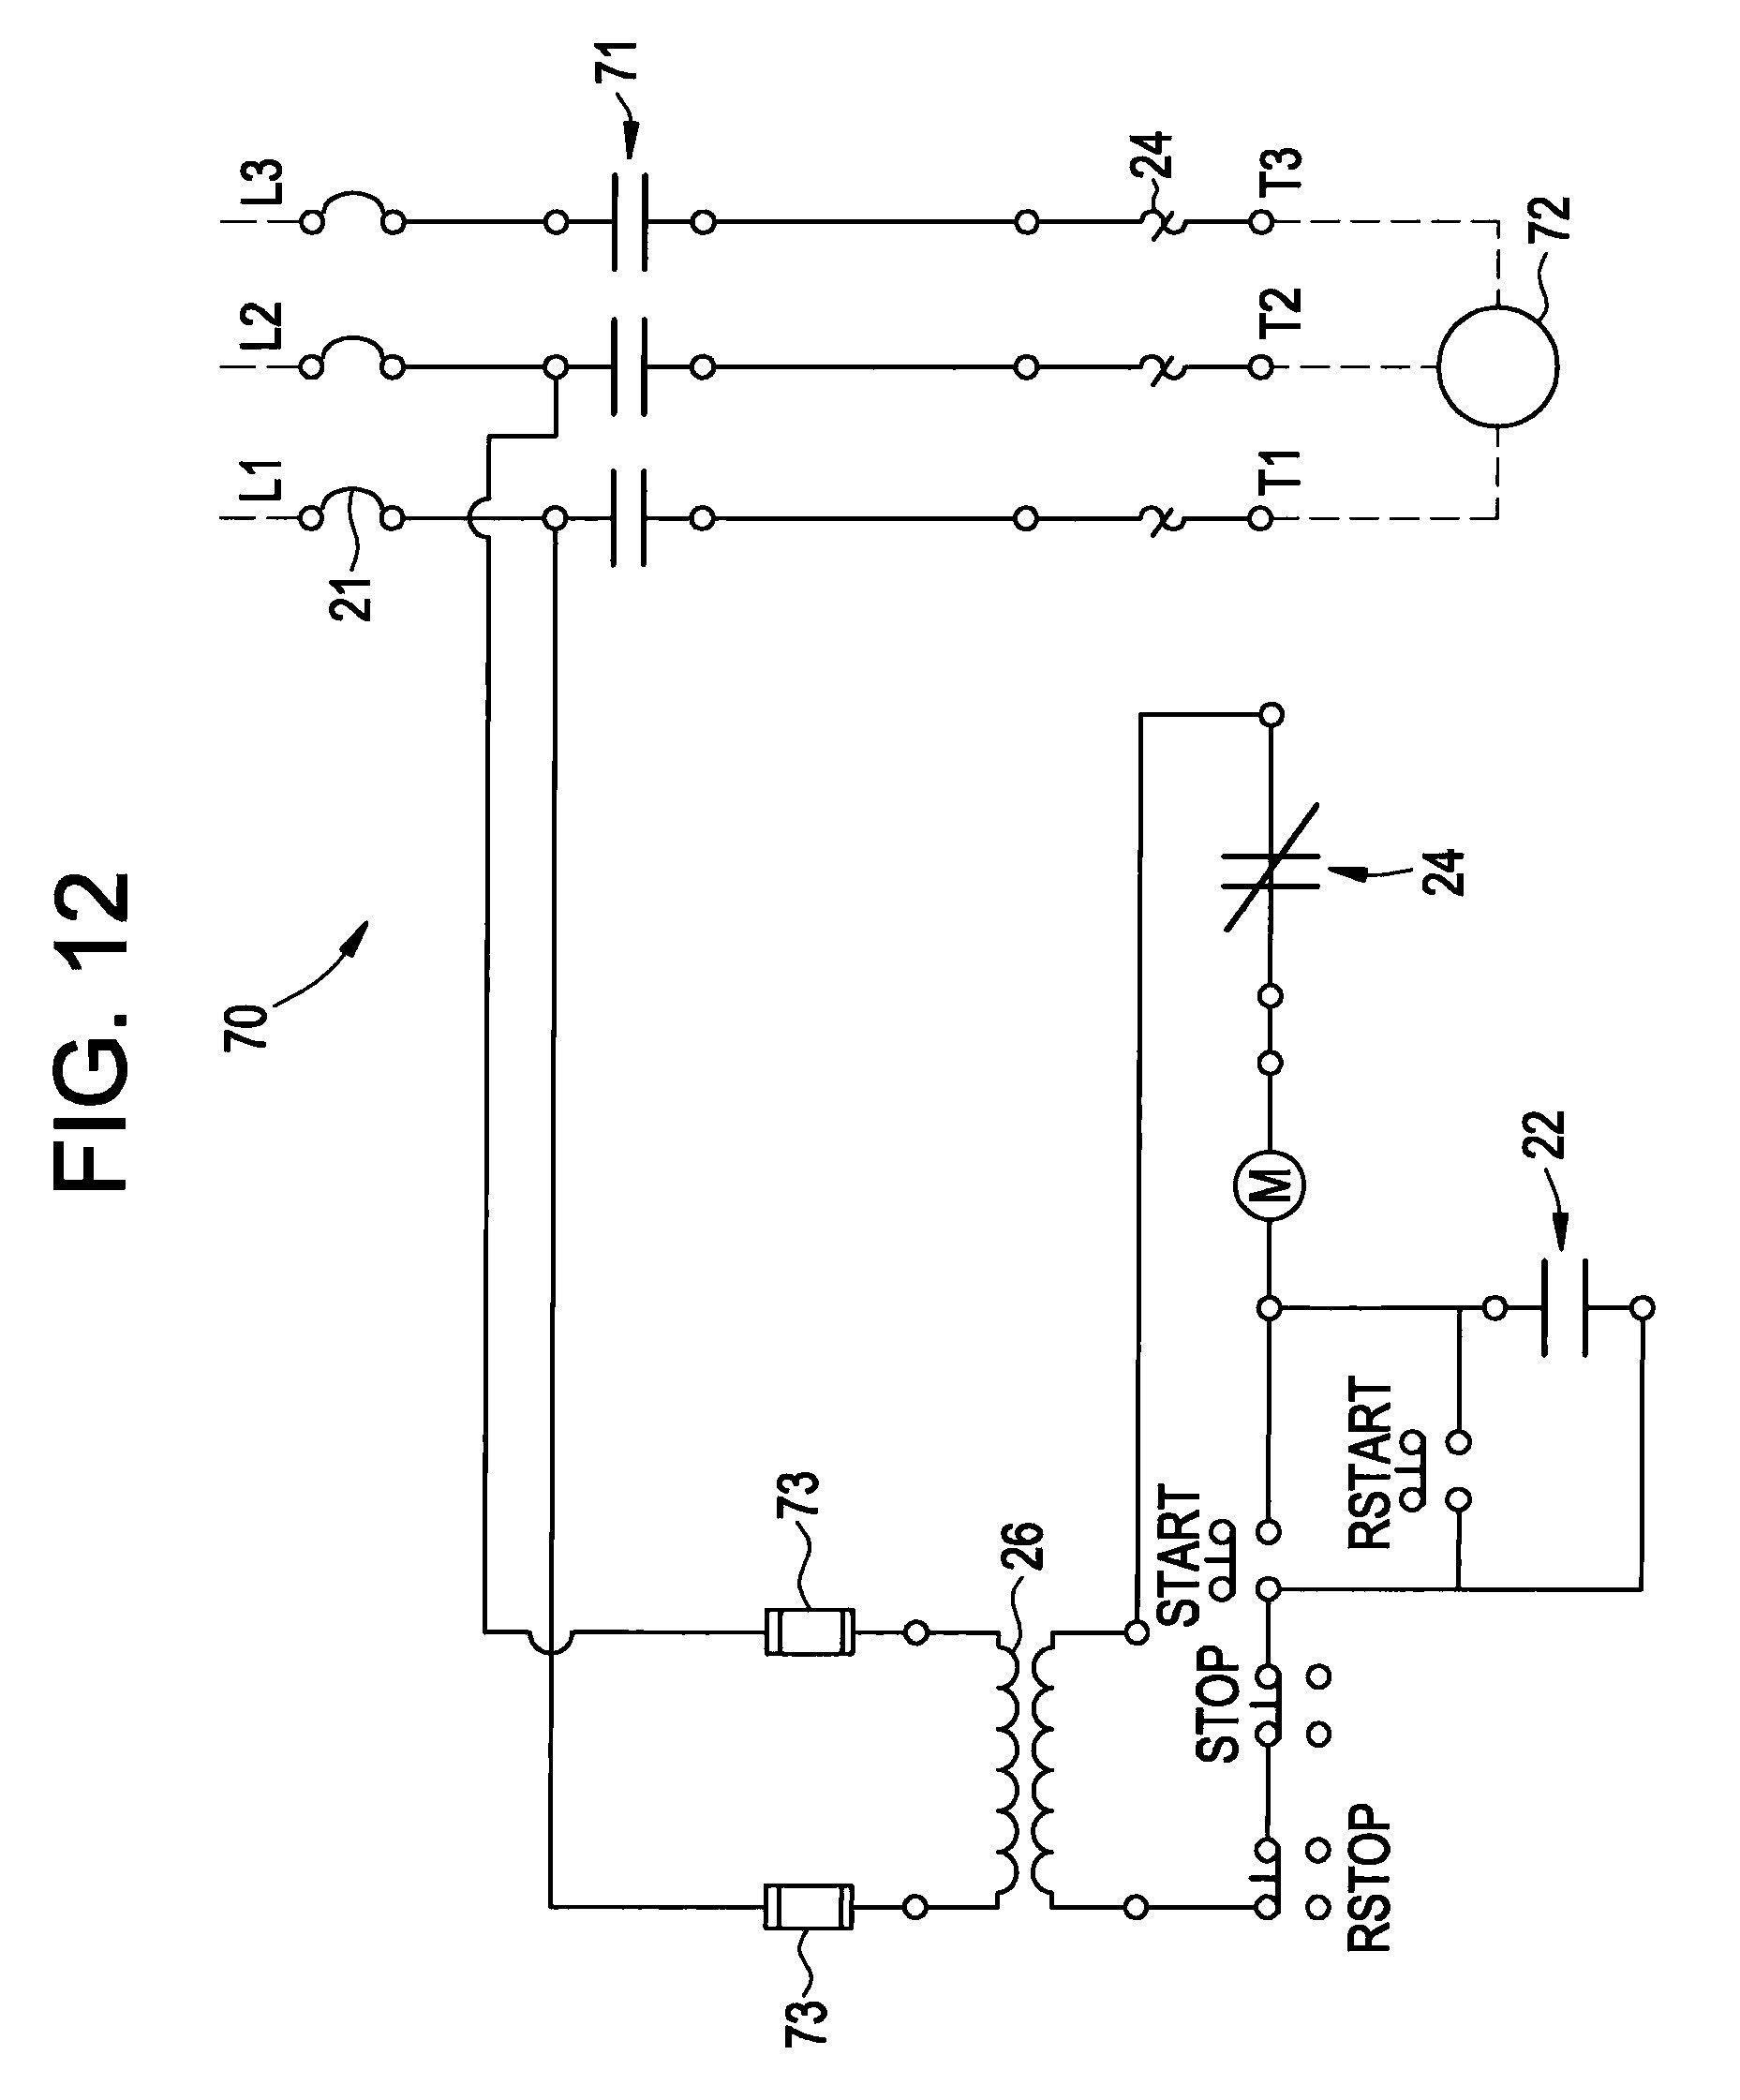 medium resolution of new wiring diagram for auto transformers diagram diagramtemplate diagramsample